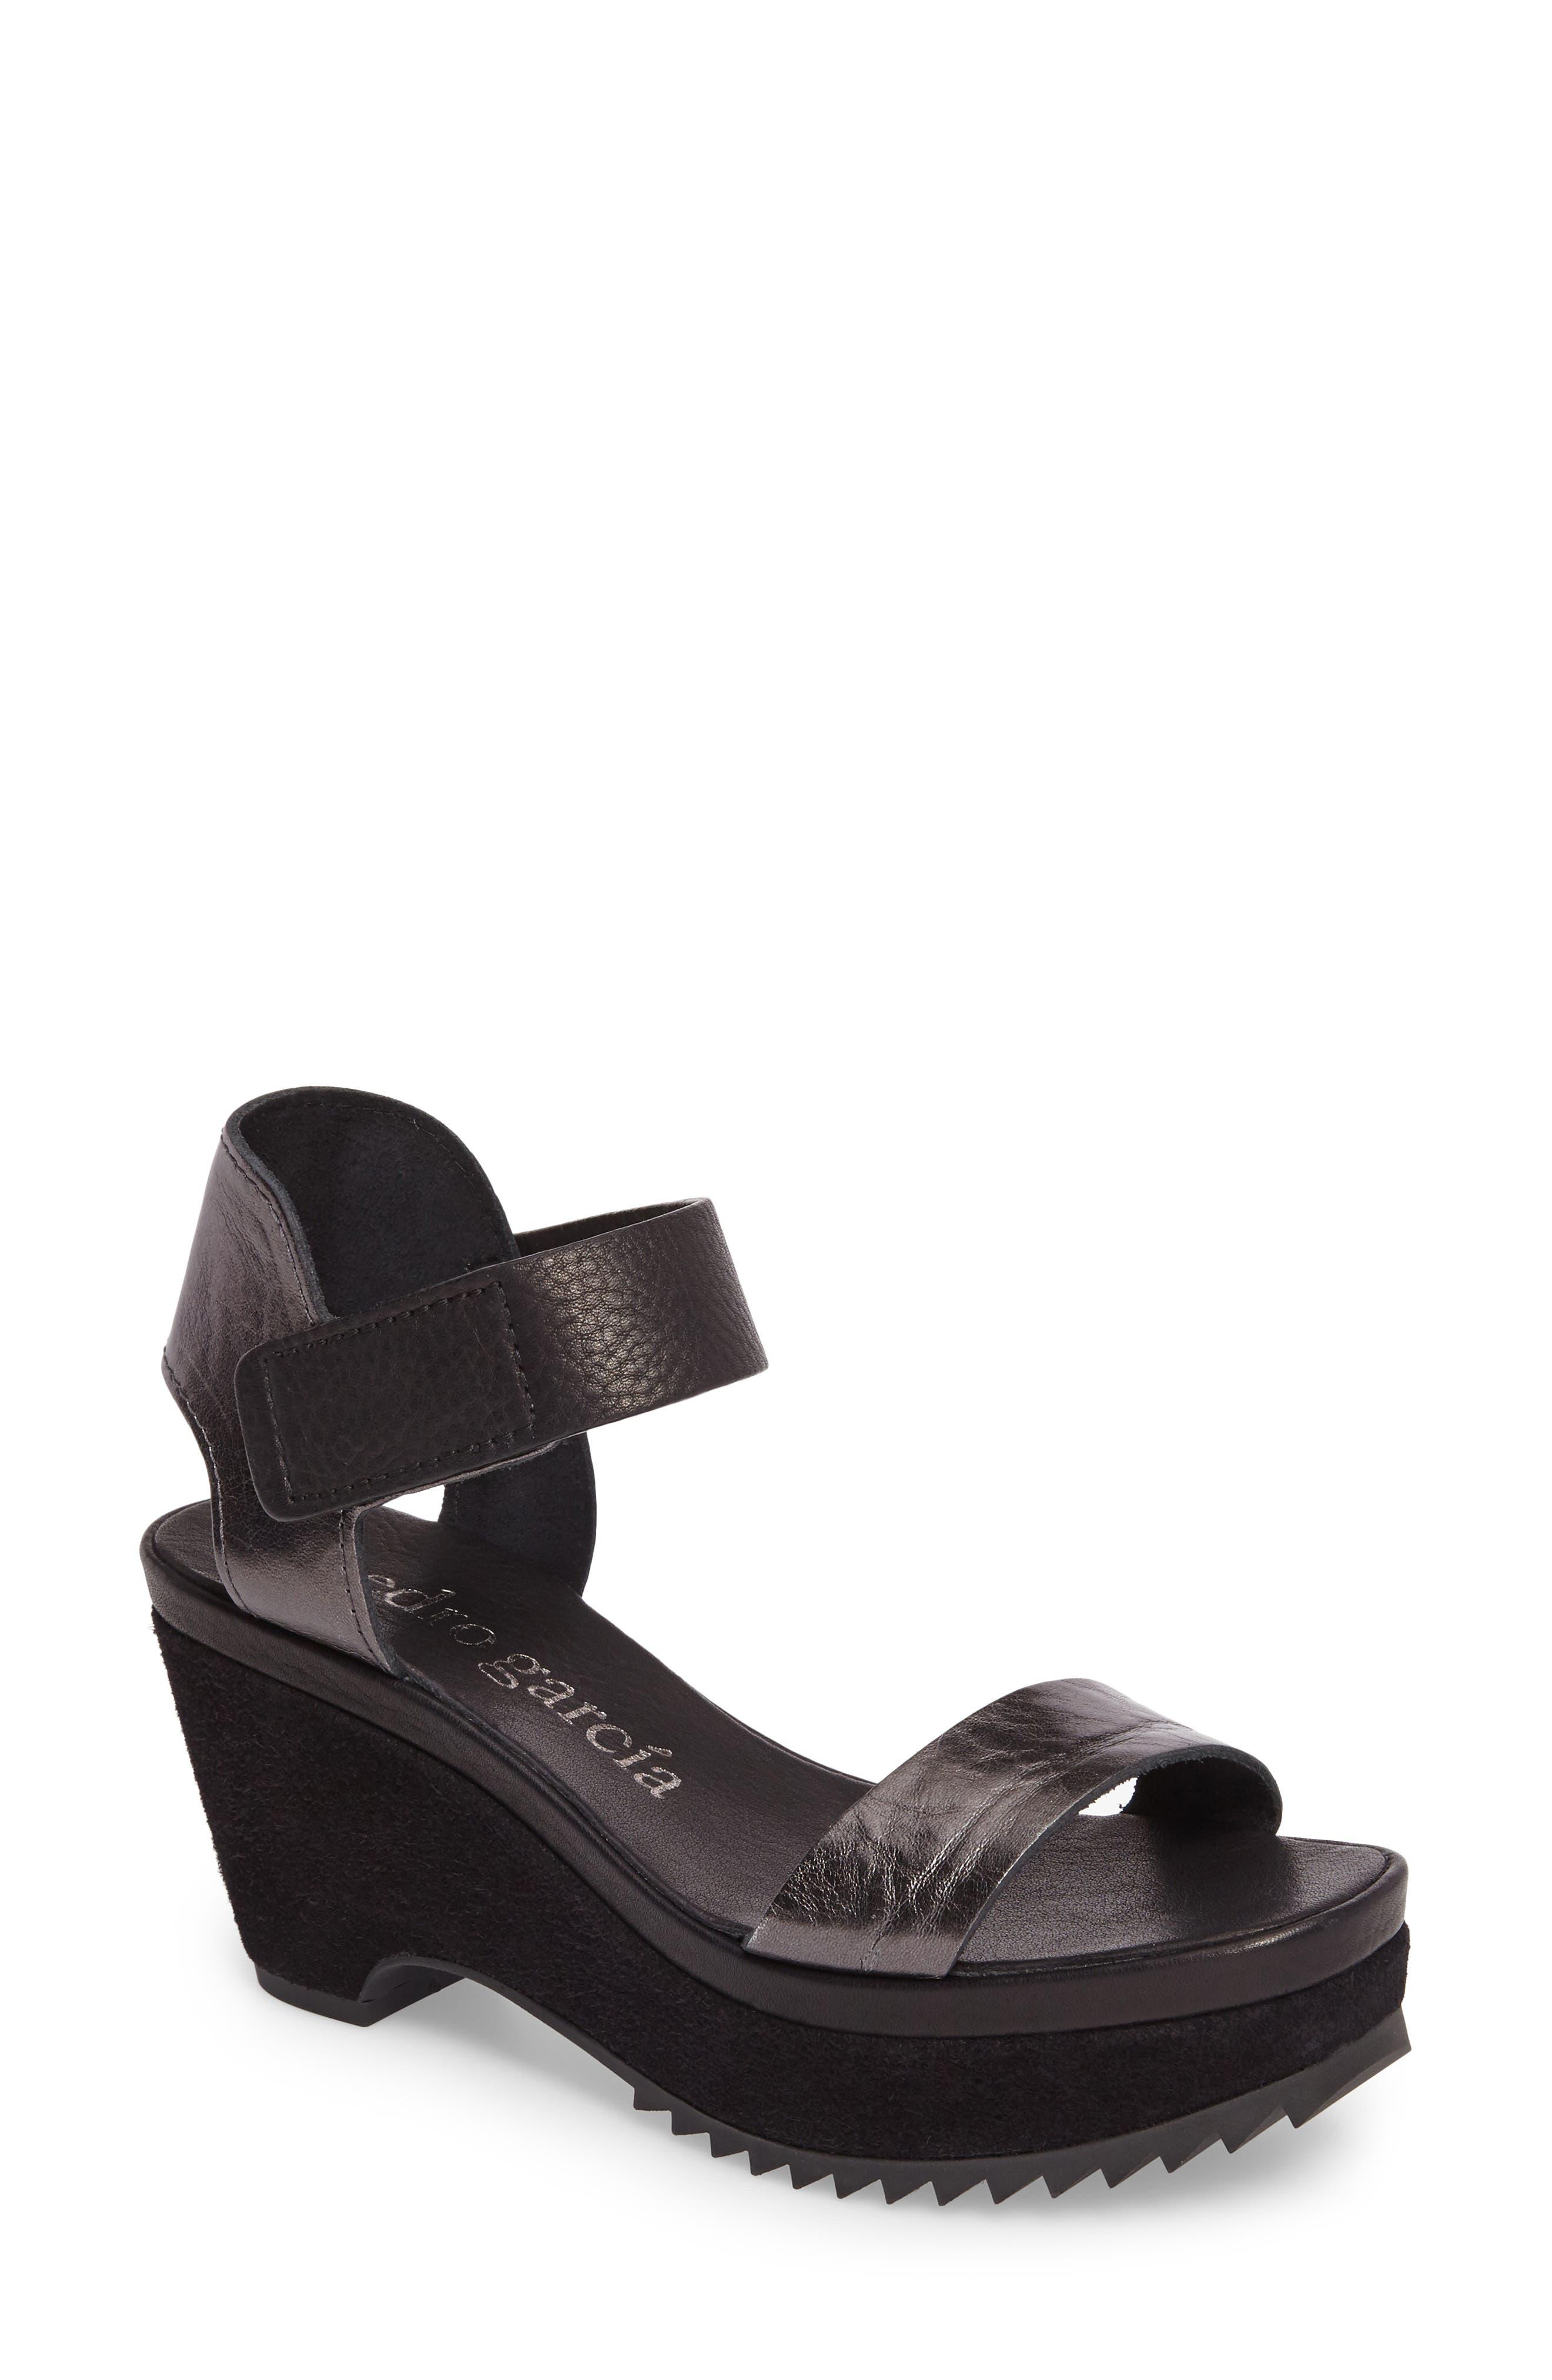 Franses Flatform Sandal,                             Main thumbnail 1, color,                             Antracite Cervo Lame